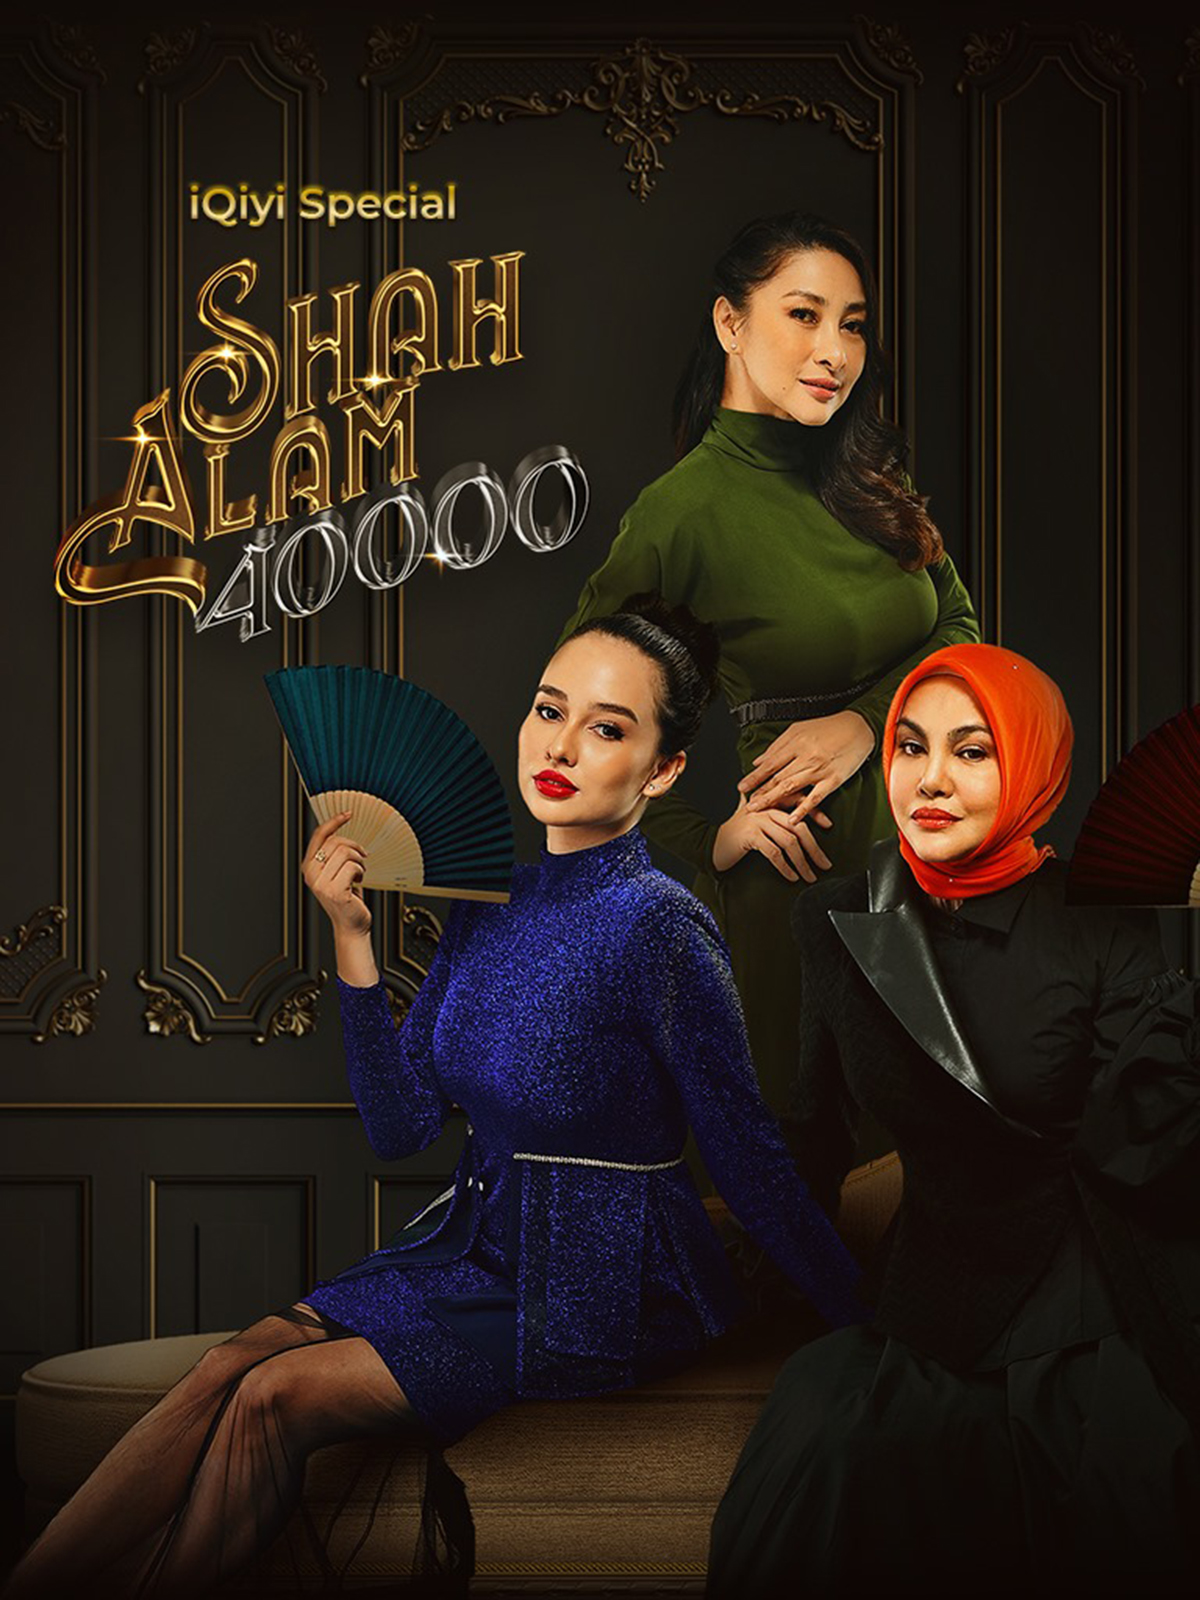 Drama Shah Alam 40000 Episod 1-28 (Akhir) Lakonan Rita Rudaini, Umie Aida dan Anna Jobling